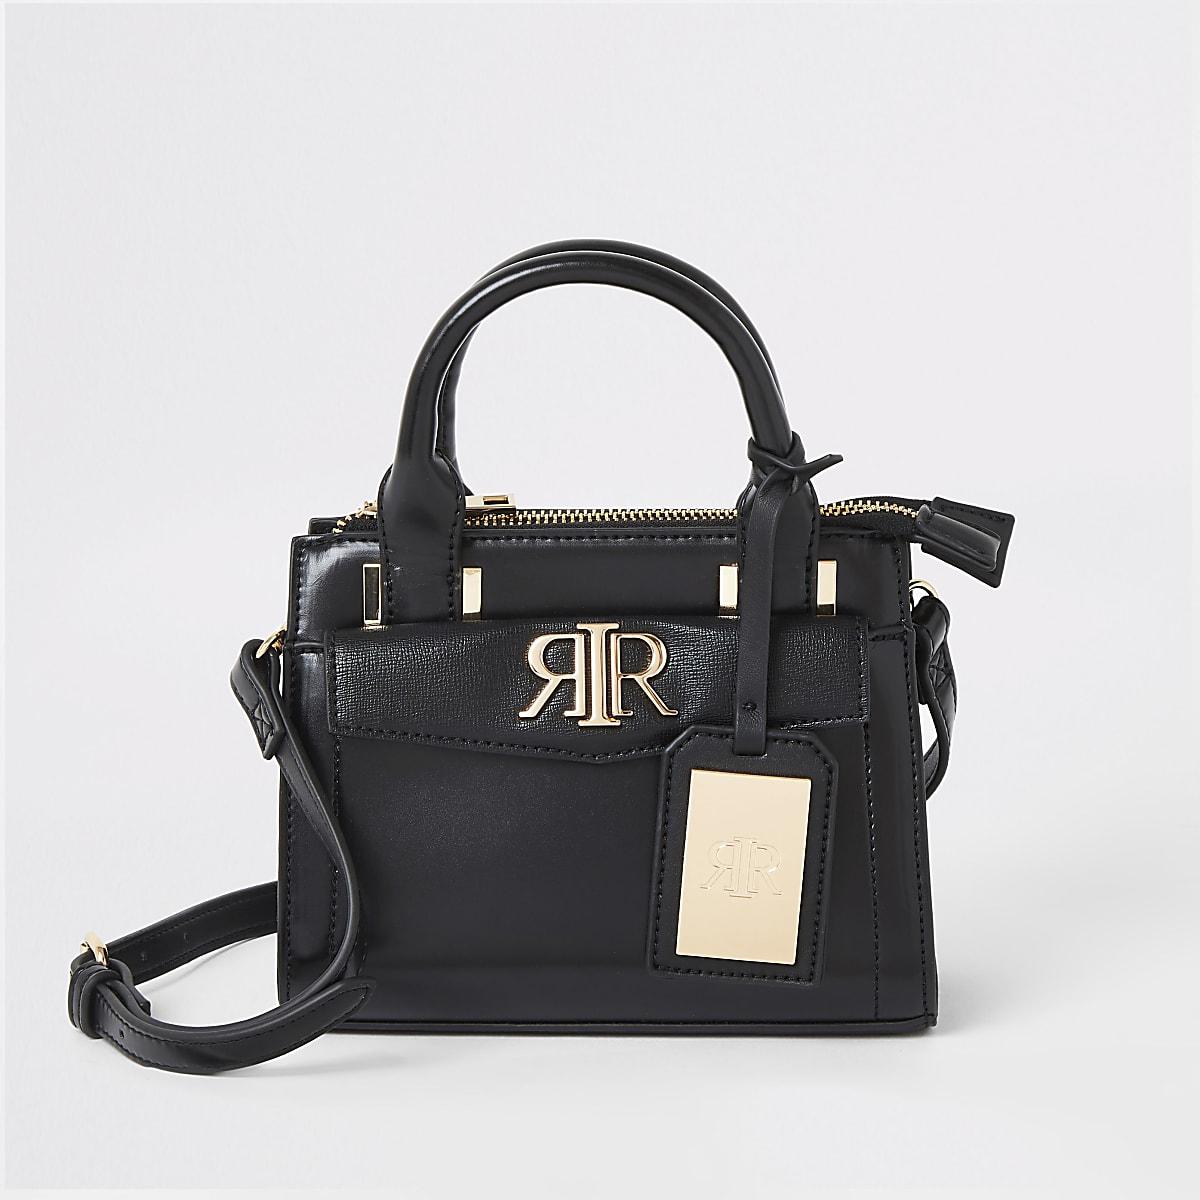 Black RI mini cross body tote bag